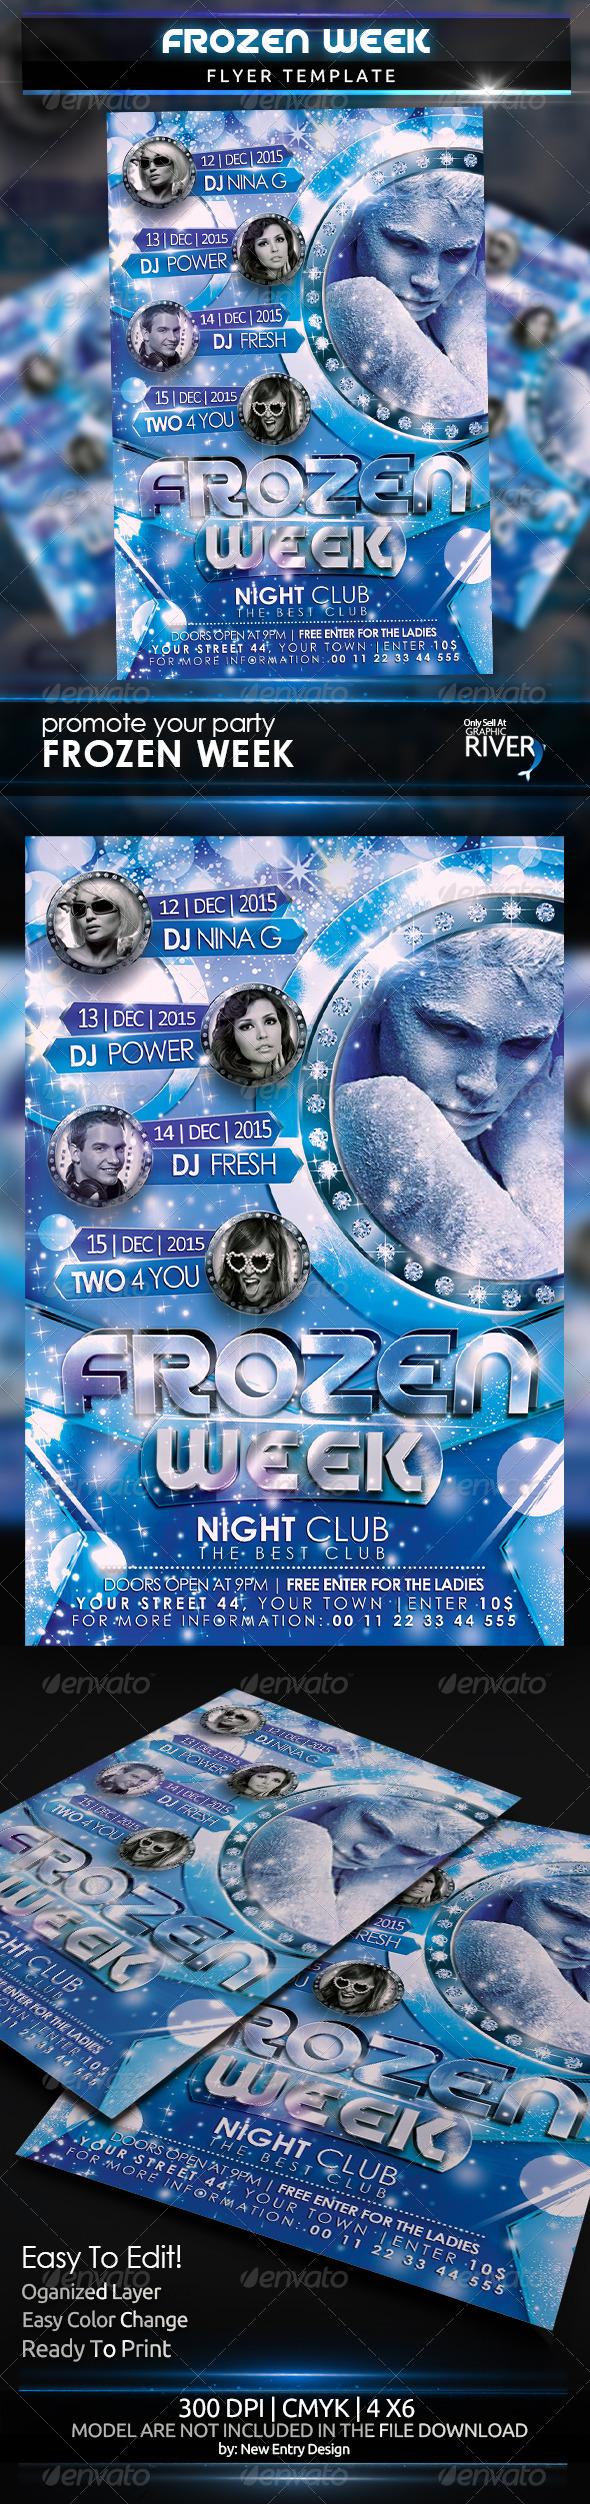 GraphicRiver Frozen Week Flyer Template 6078467